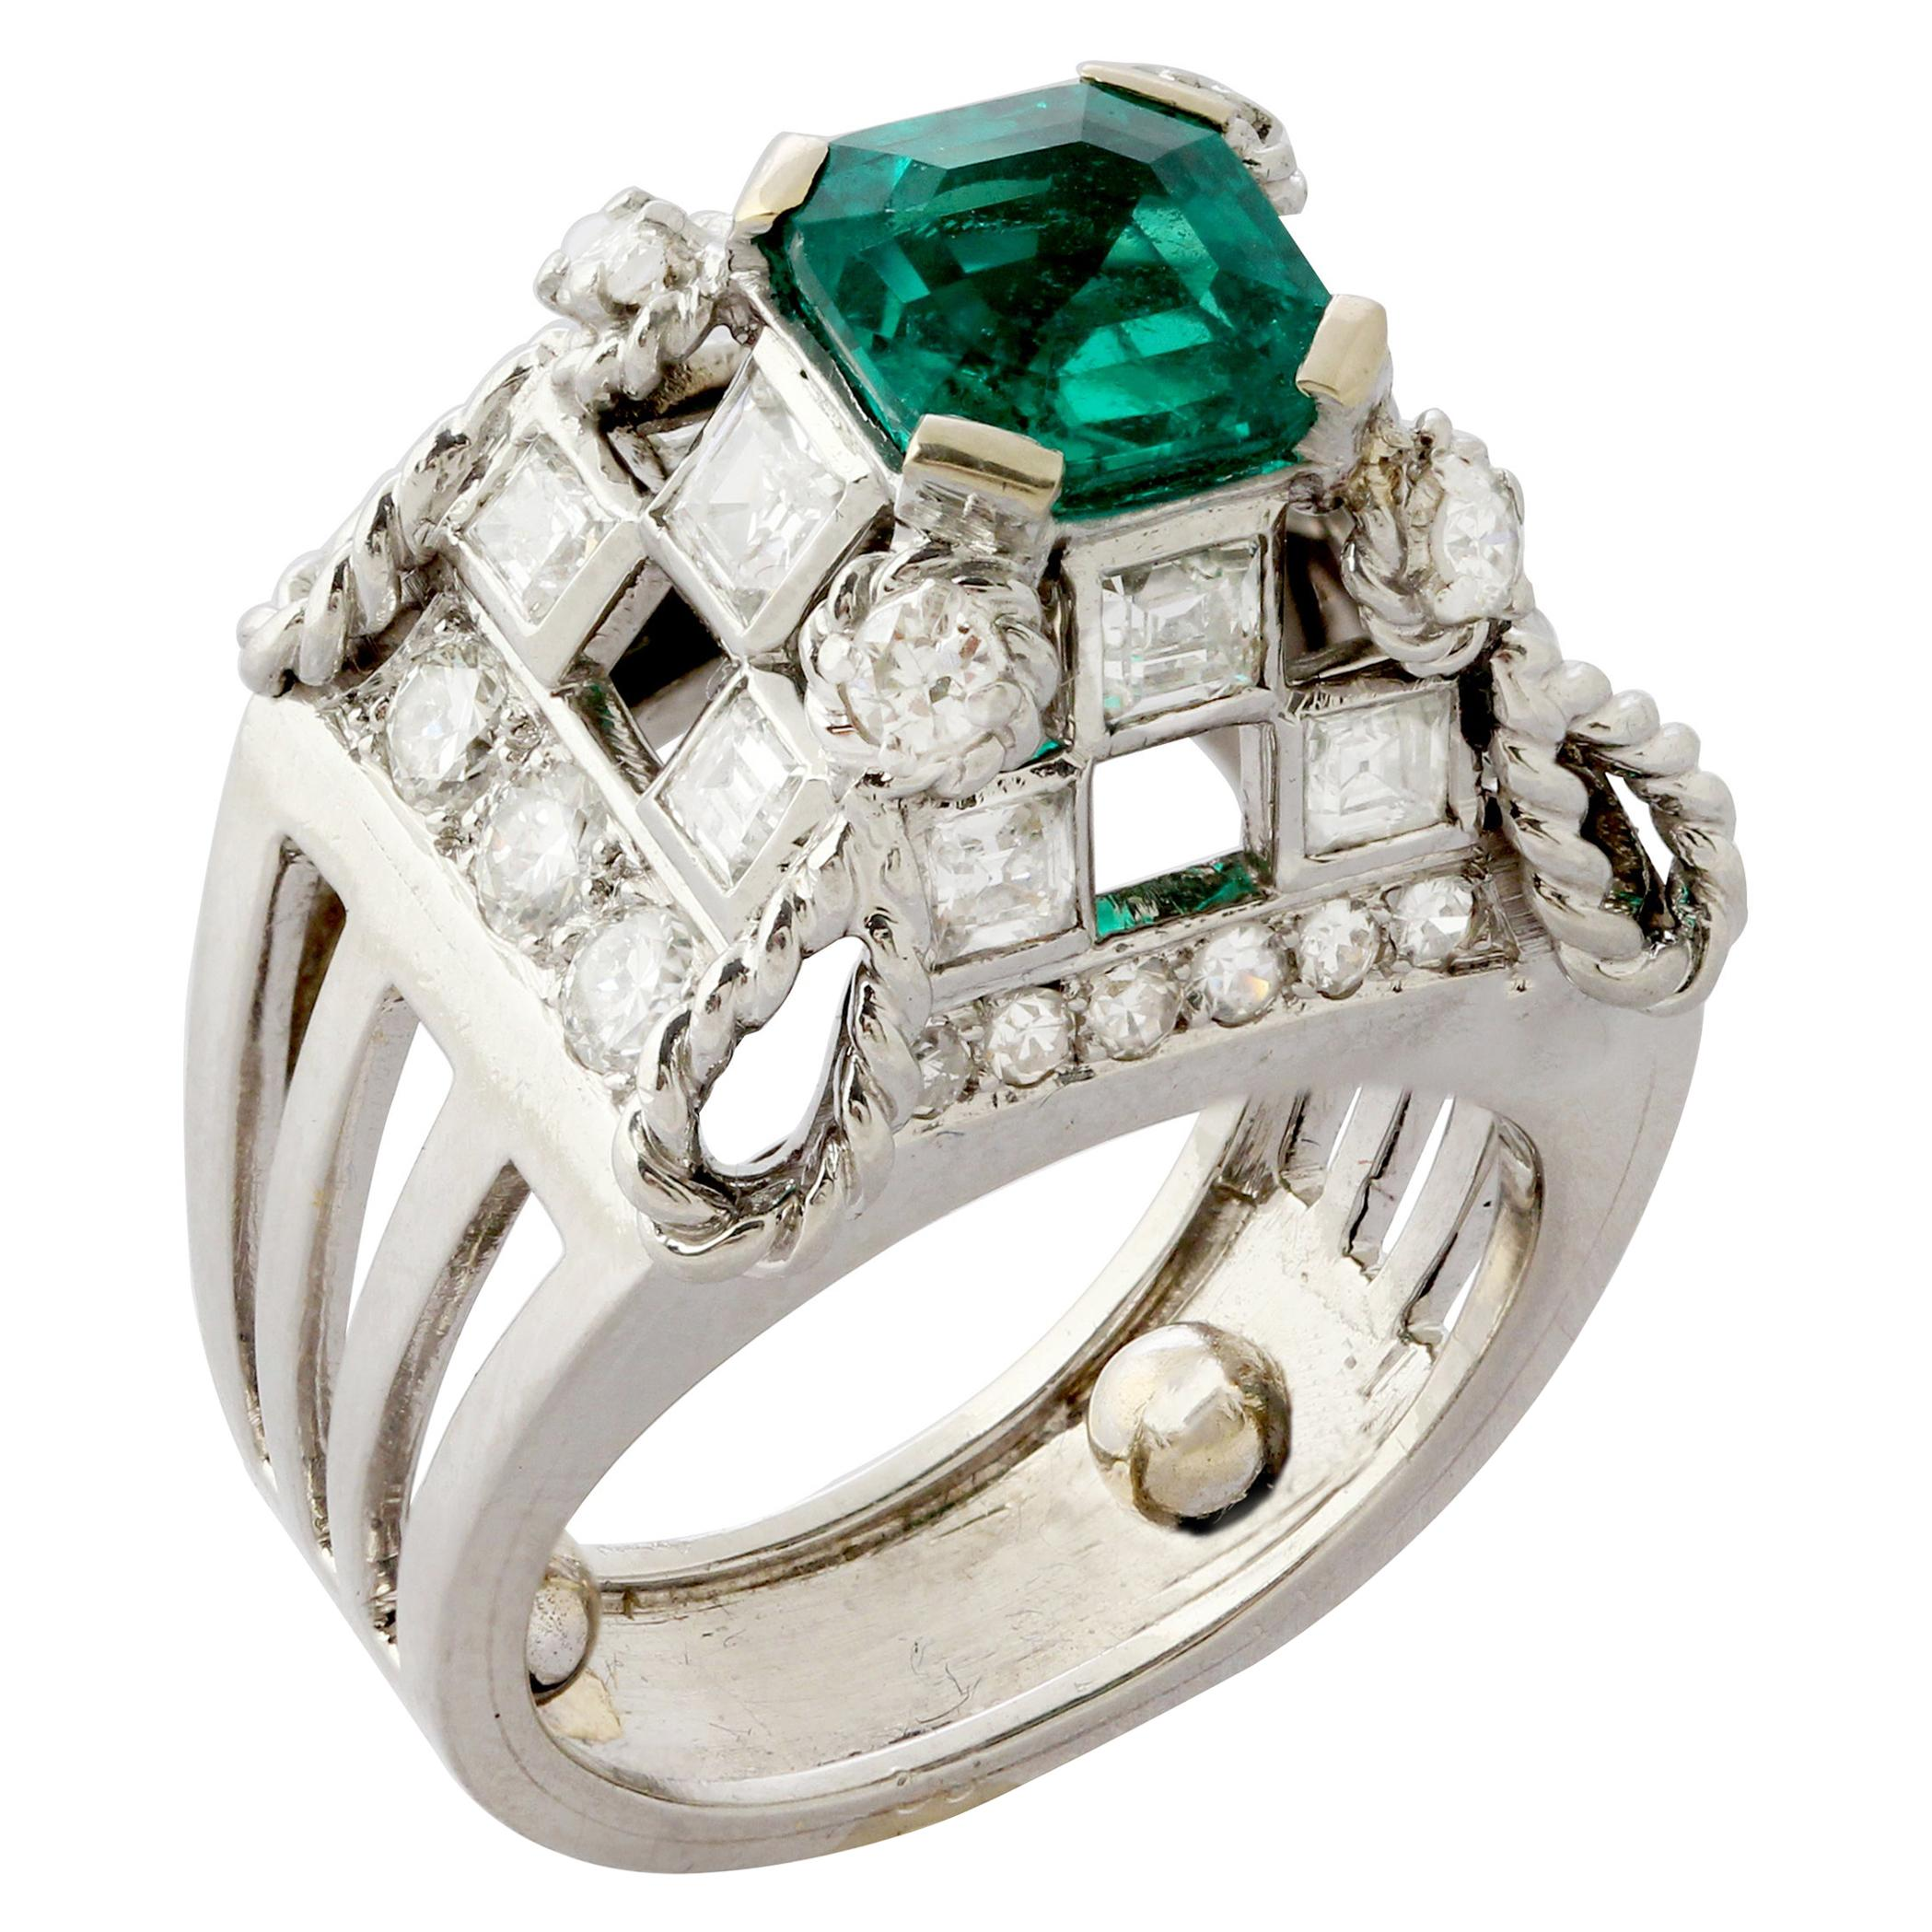 French Platinum, Diamond & Colombian Emerald Ring